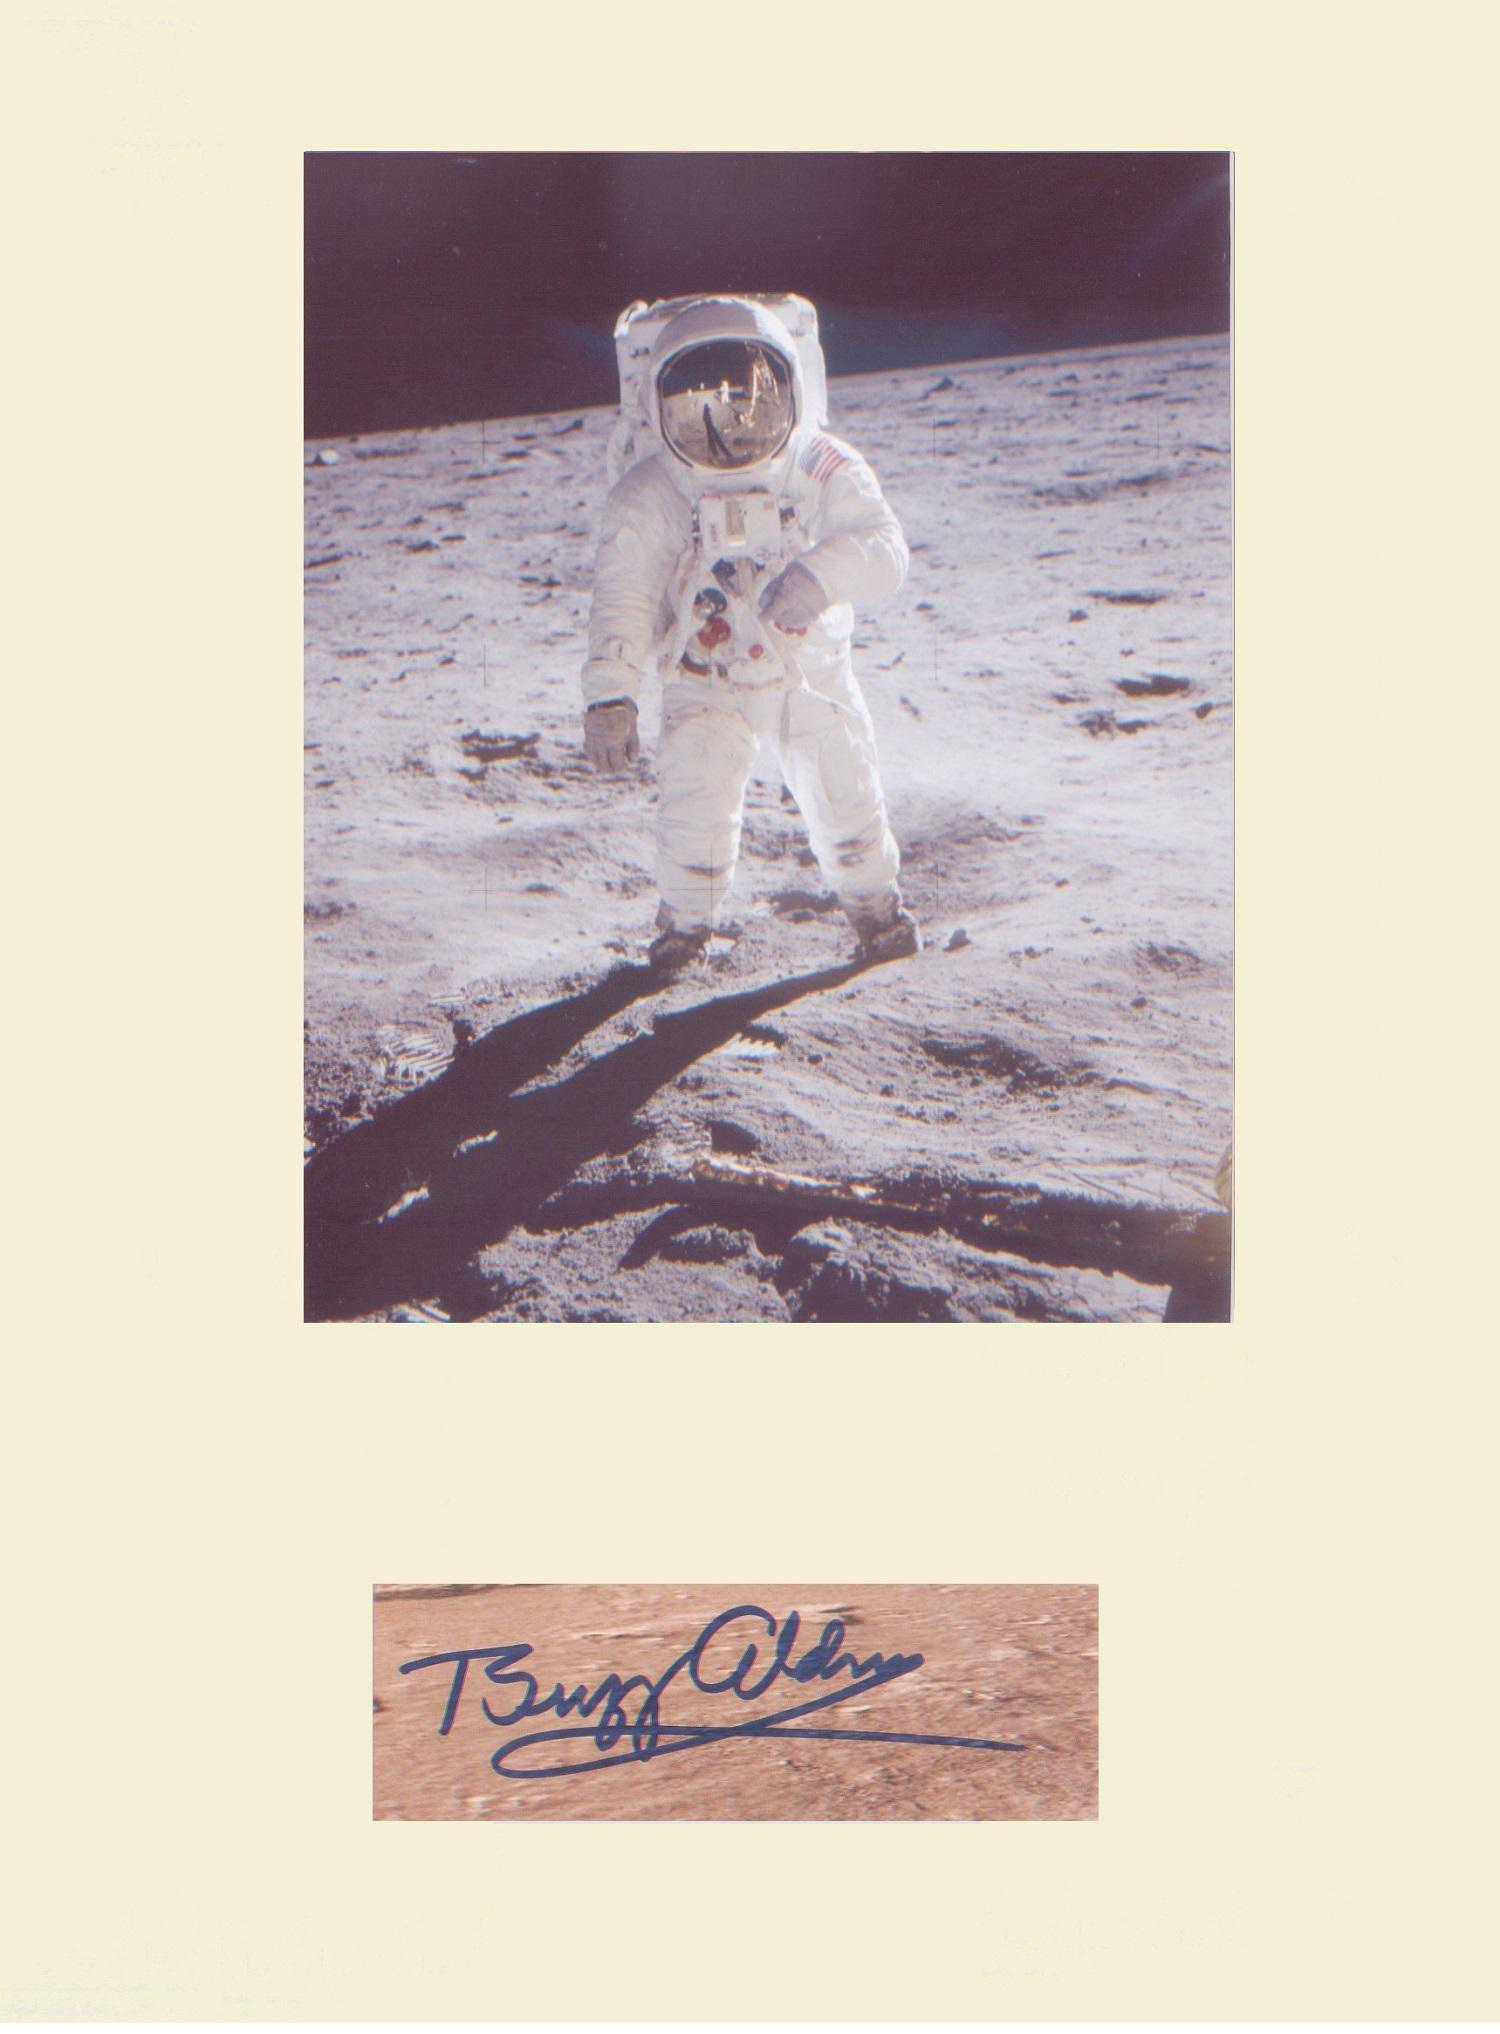 Apollo11 Astronaut Buzz Aldrin. Signature mounted with